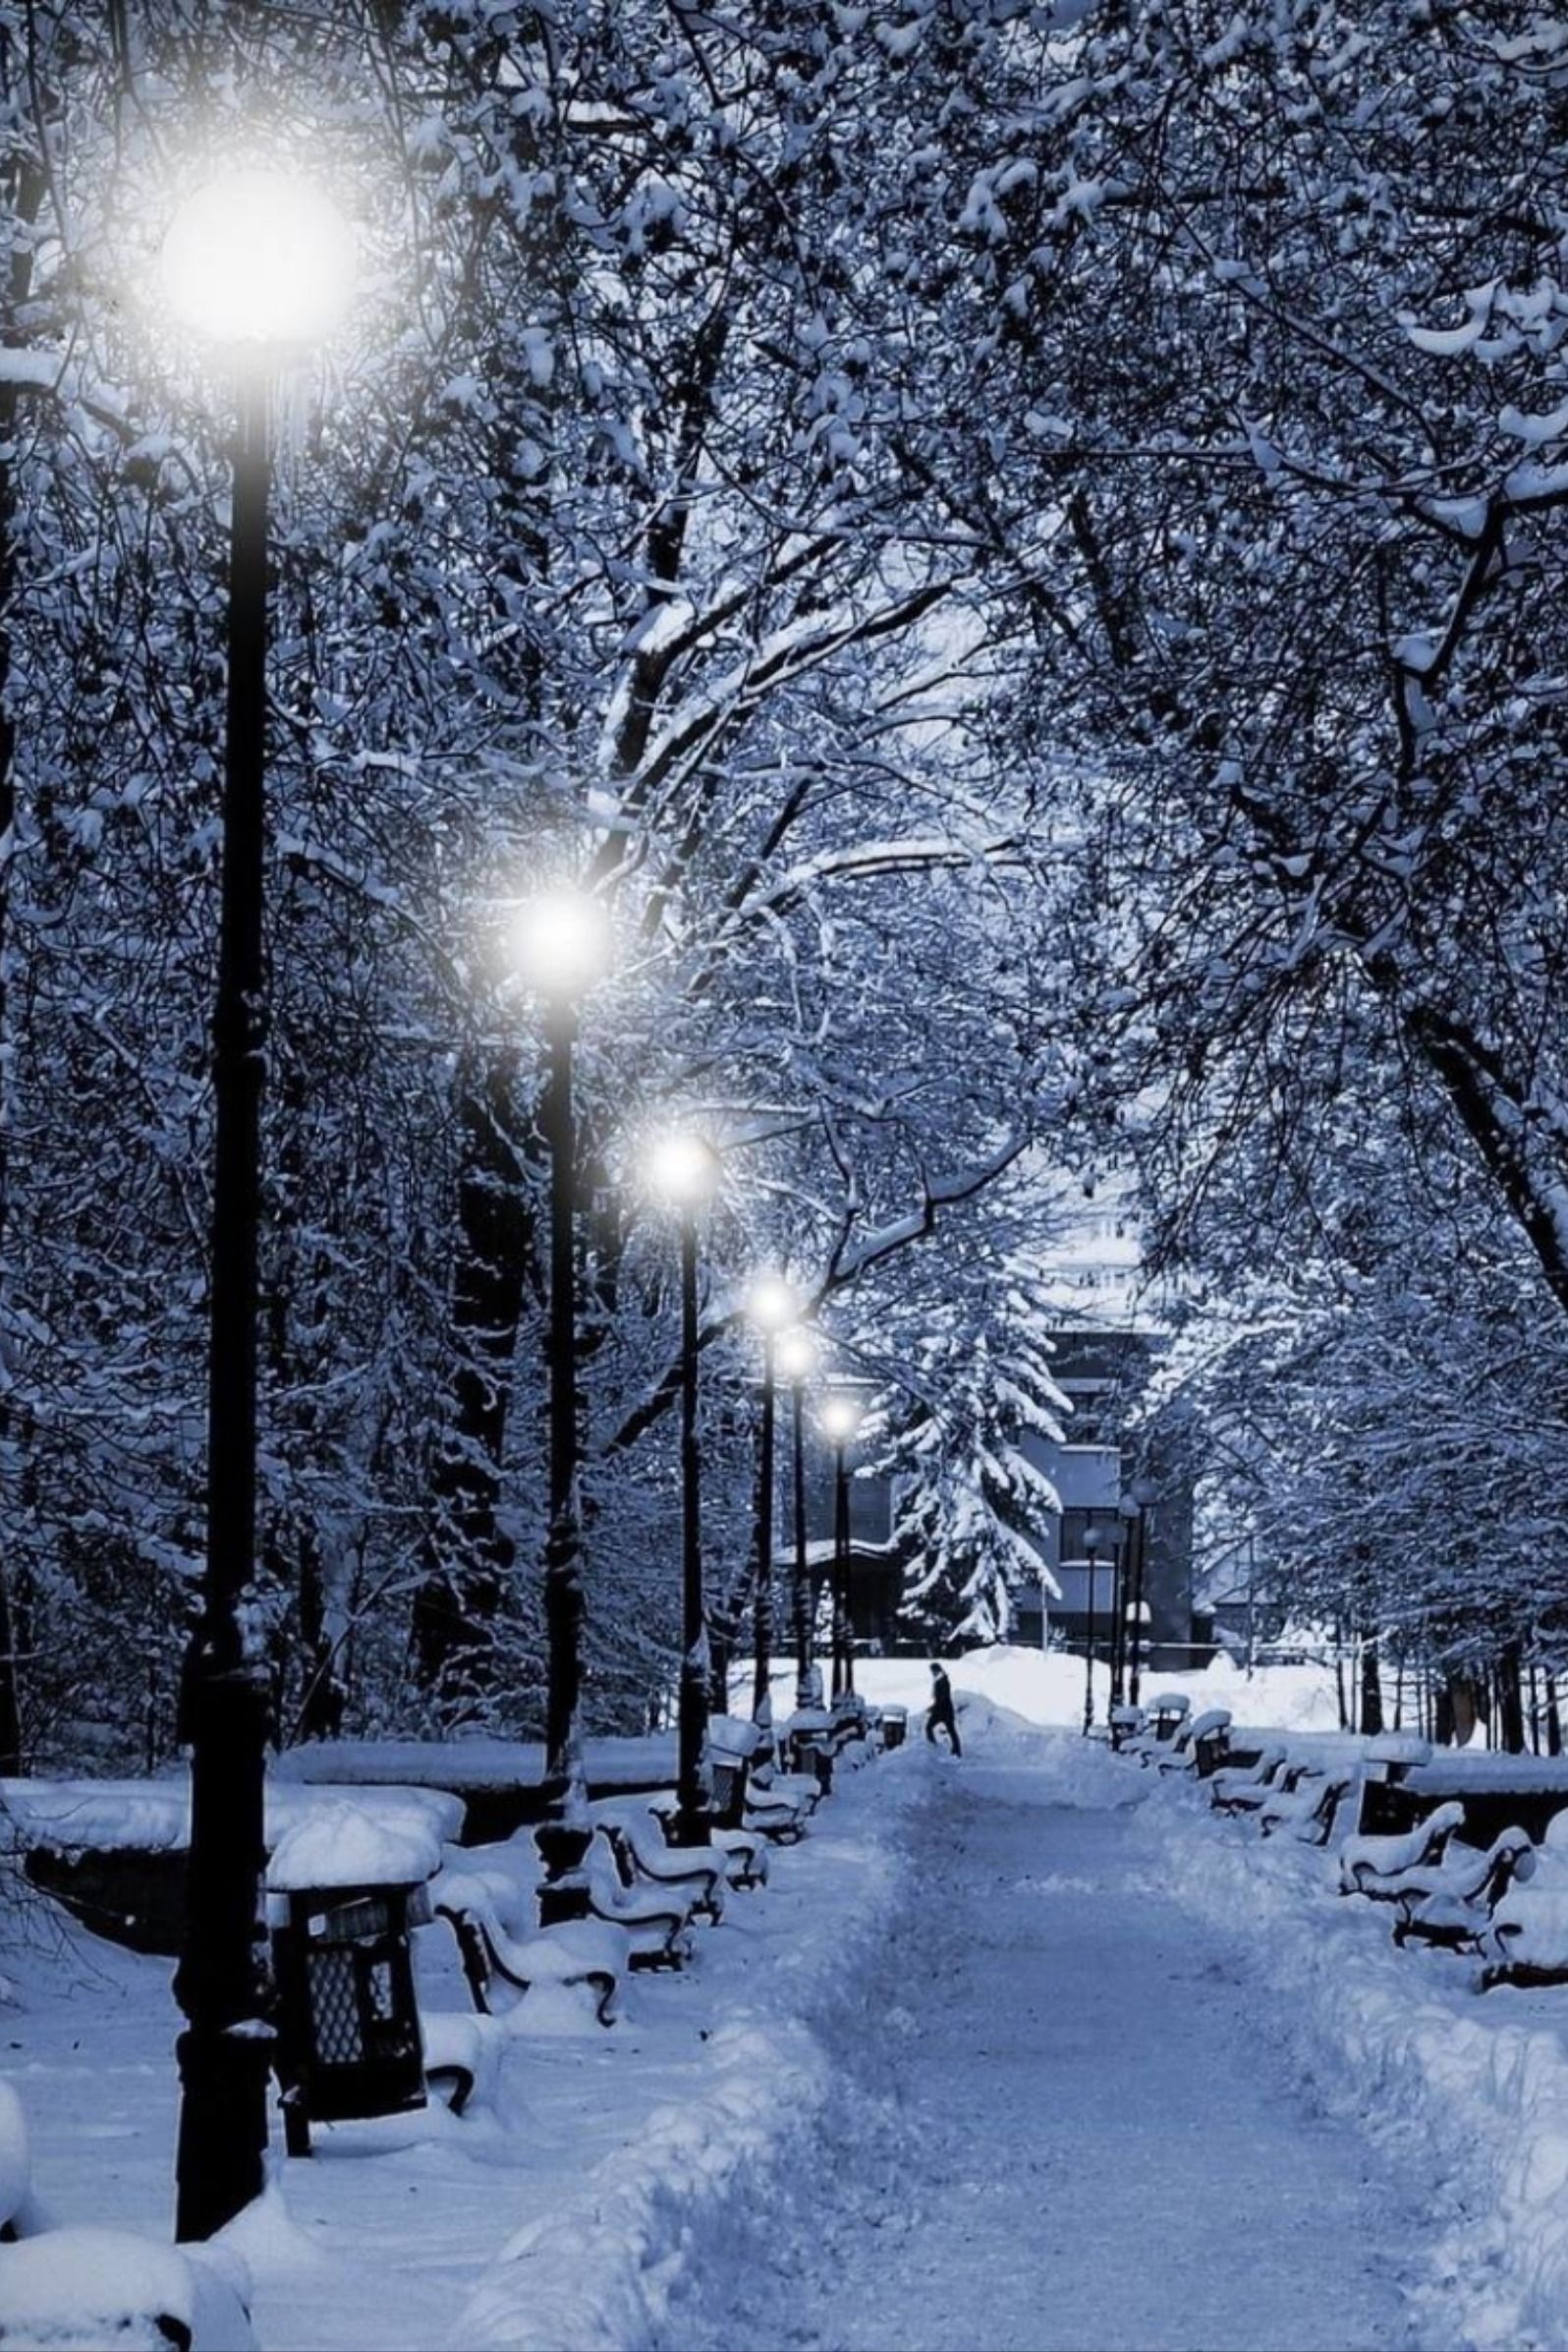 12 Best Cristmas Wallpaper For Desktop Or Mobile Fully Responsive 736197870322039846 Winter Scenery Winter Pictures Winter Landscape